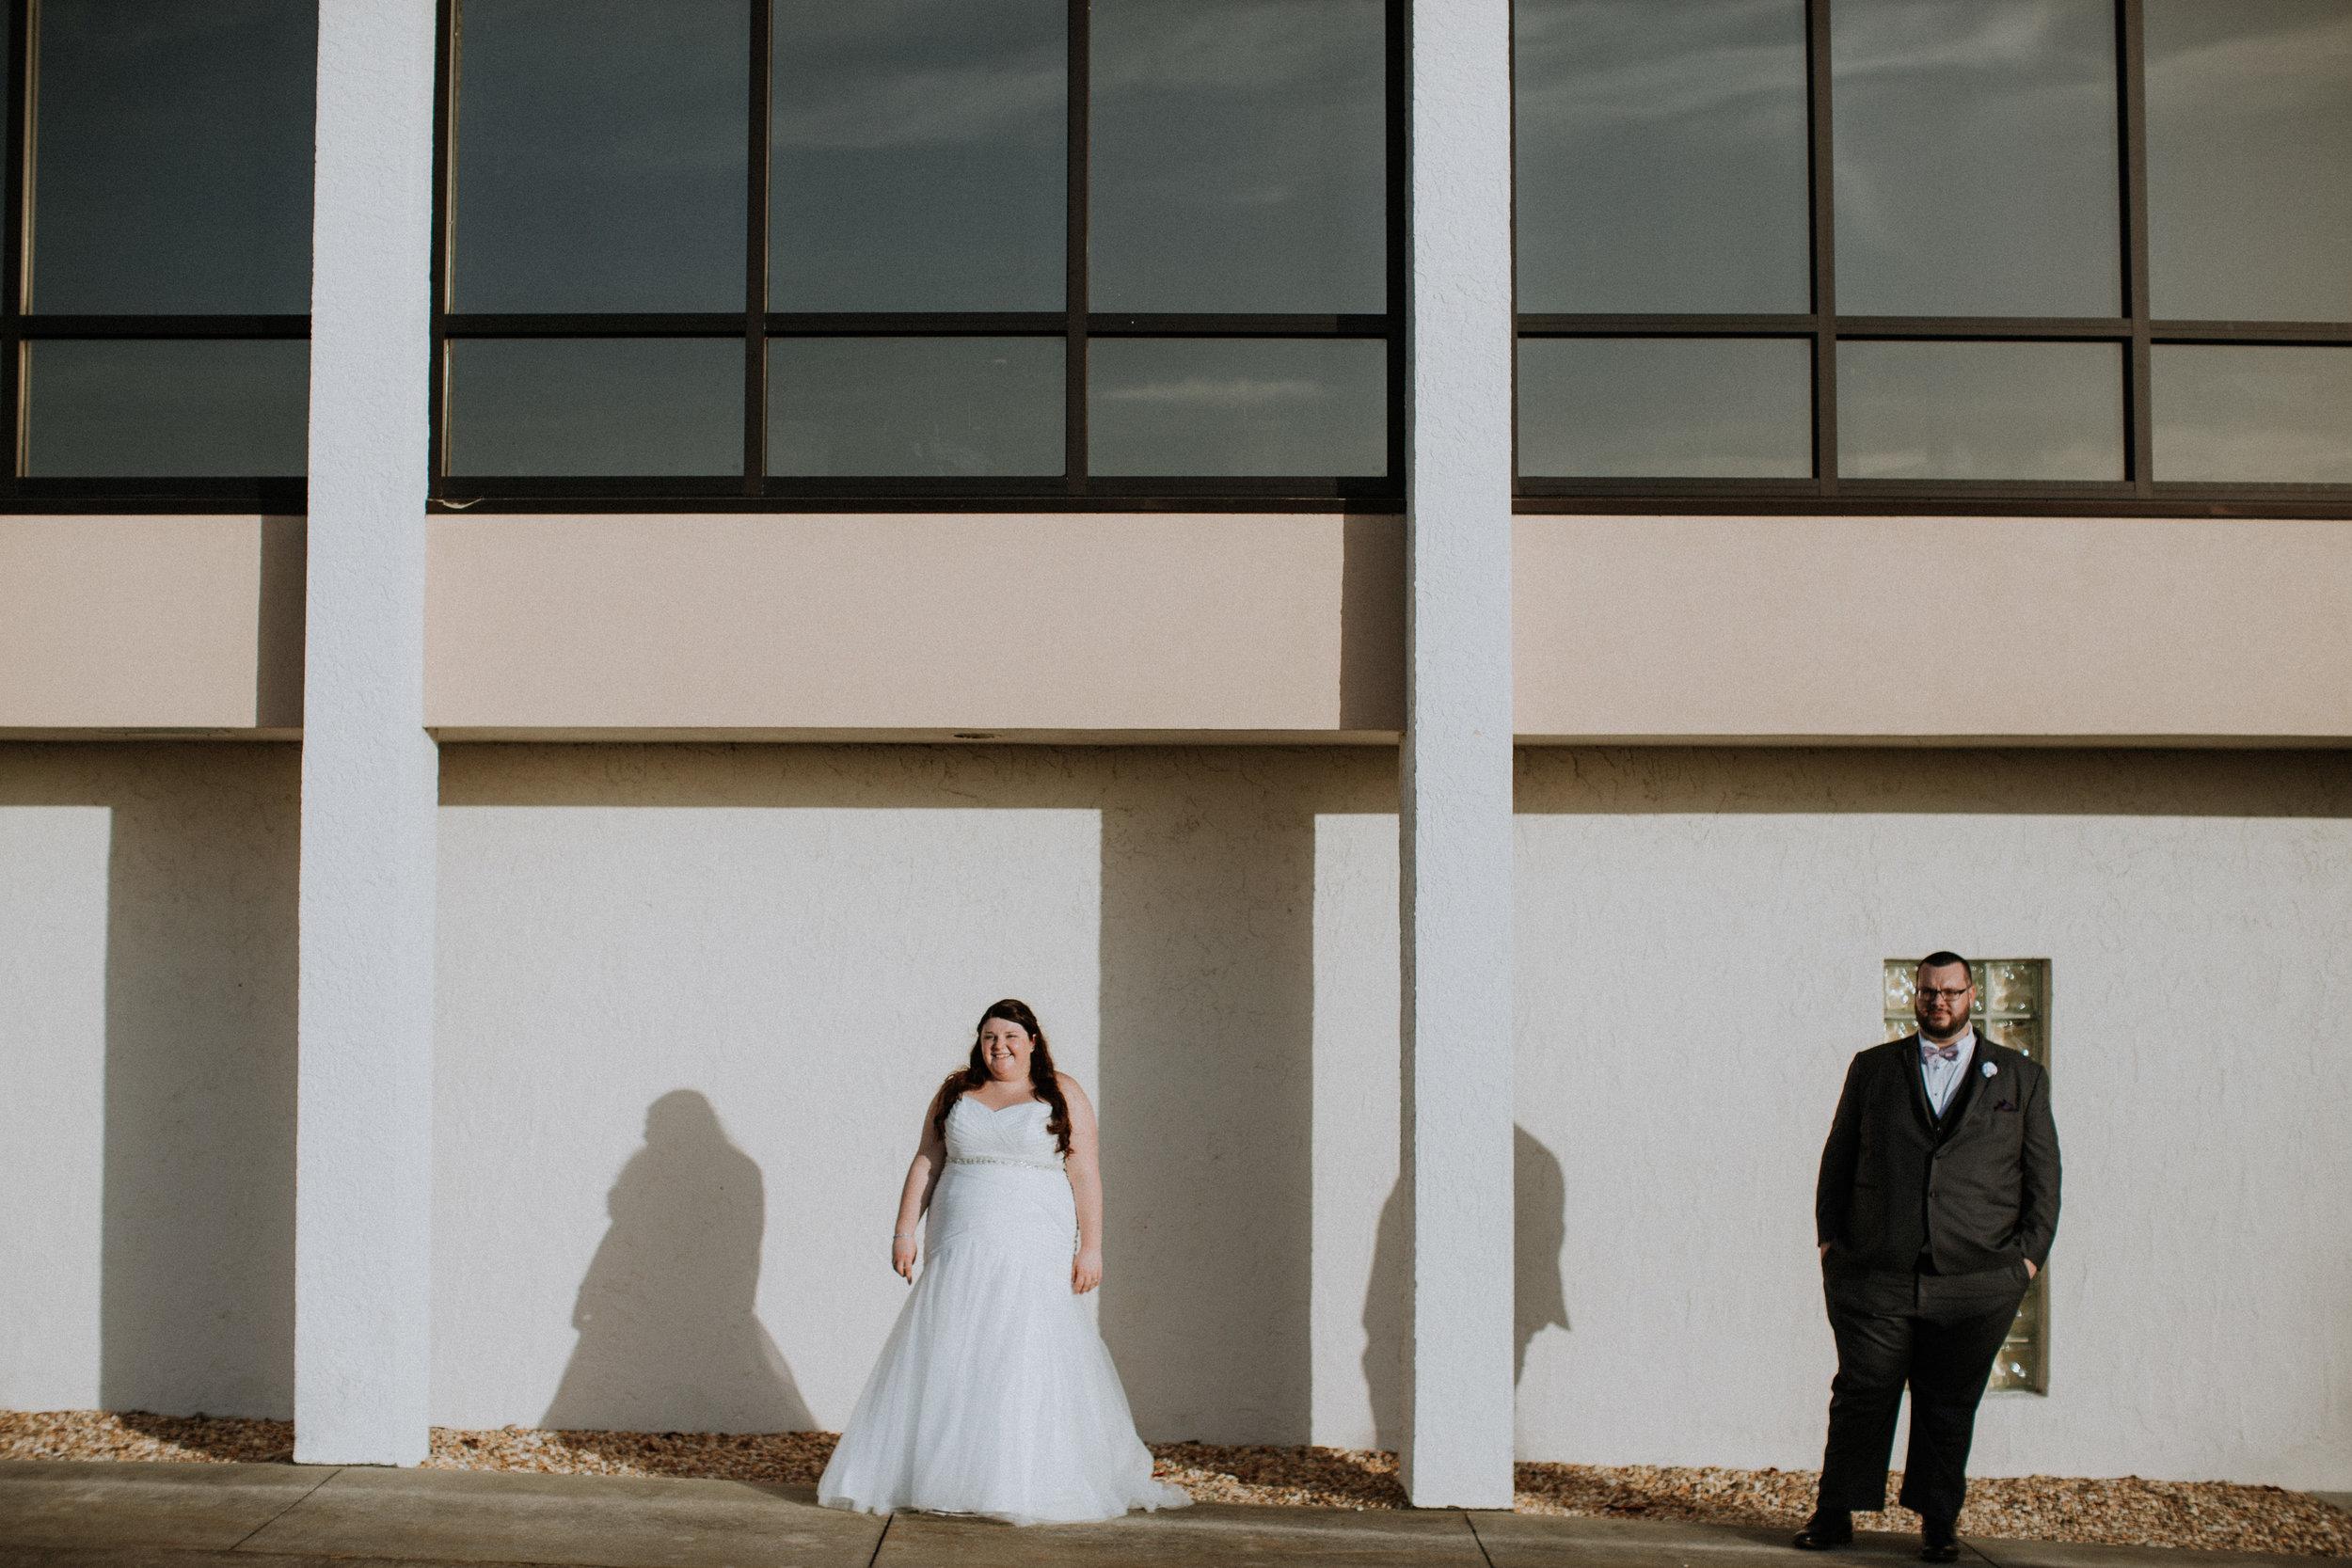 appolloni_new smyrna_wedding-697.jpg